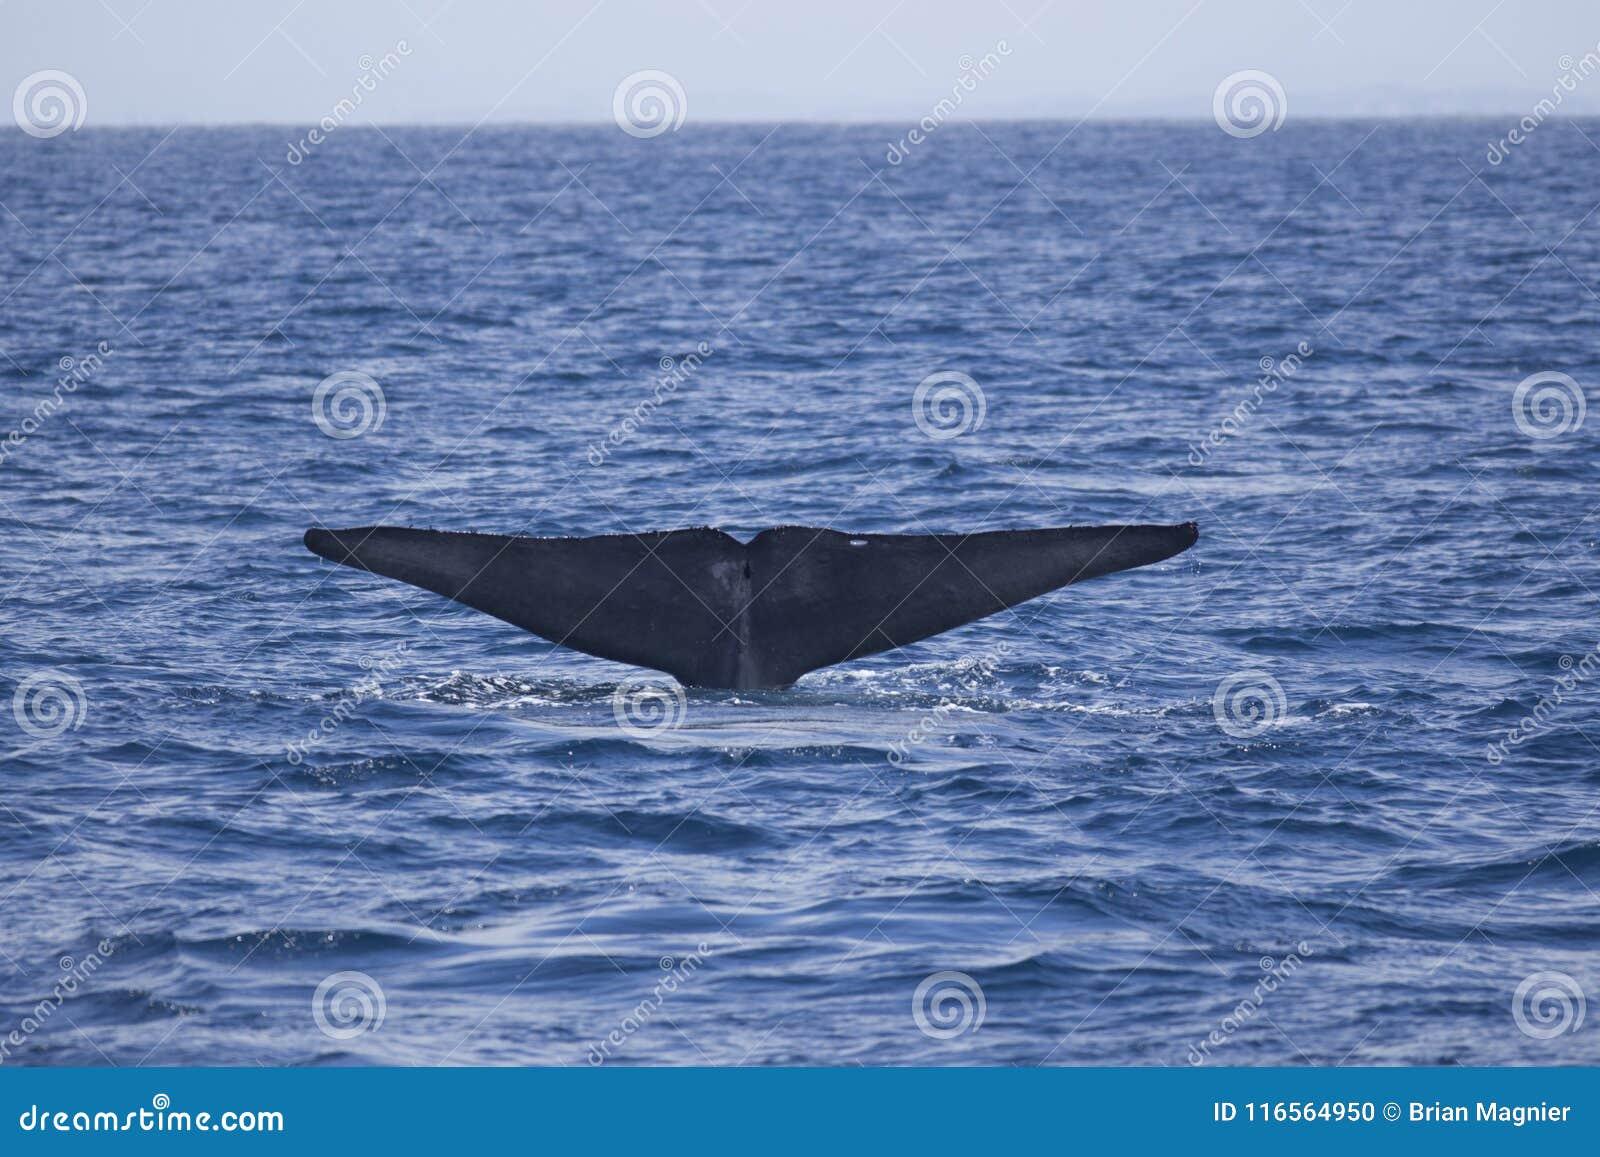 Blue Whale flukes off California